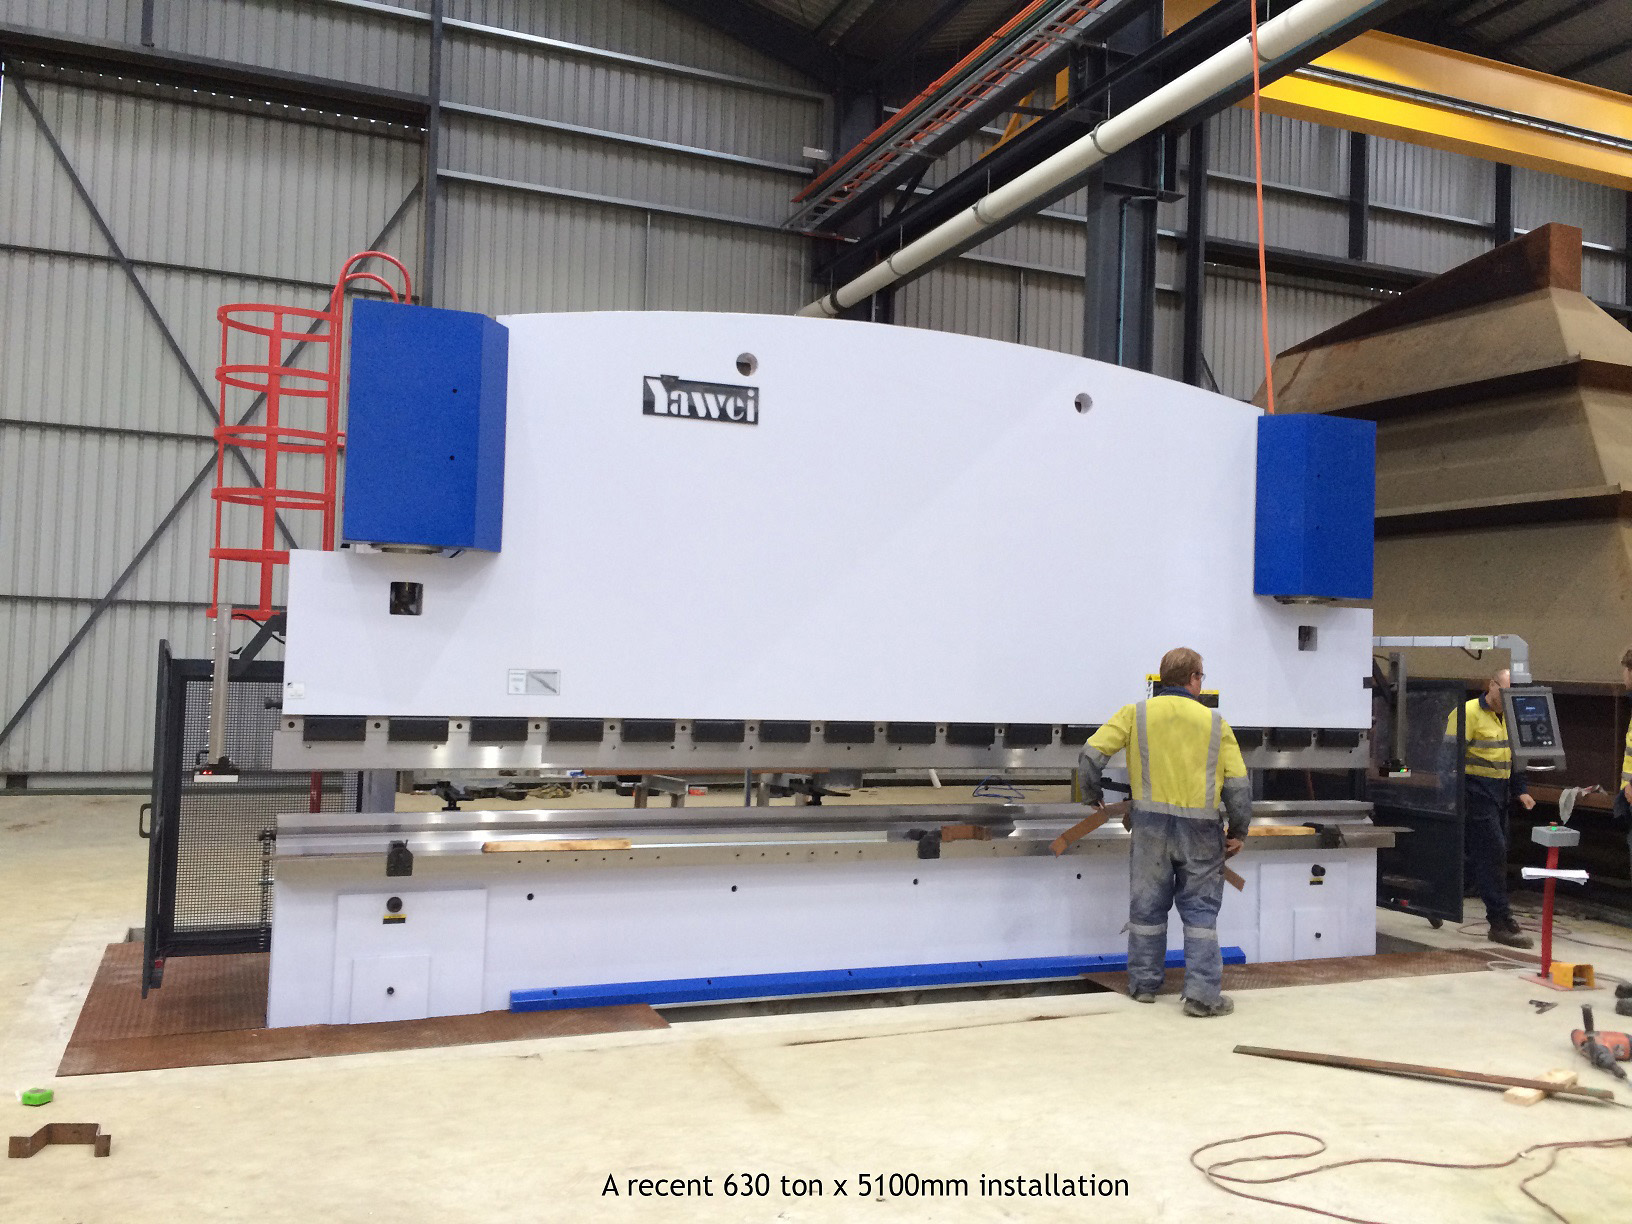 YAWEI PBH 500-6200 CNC4 (52S)